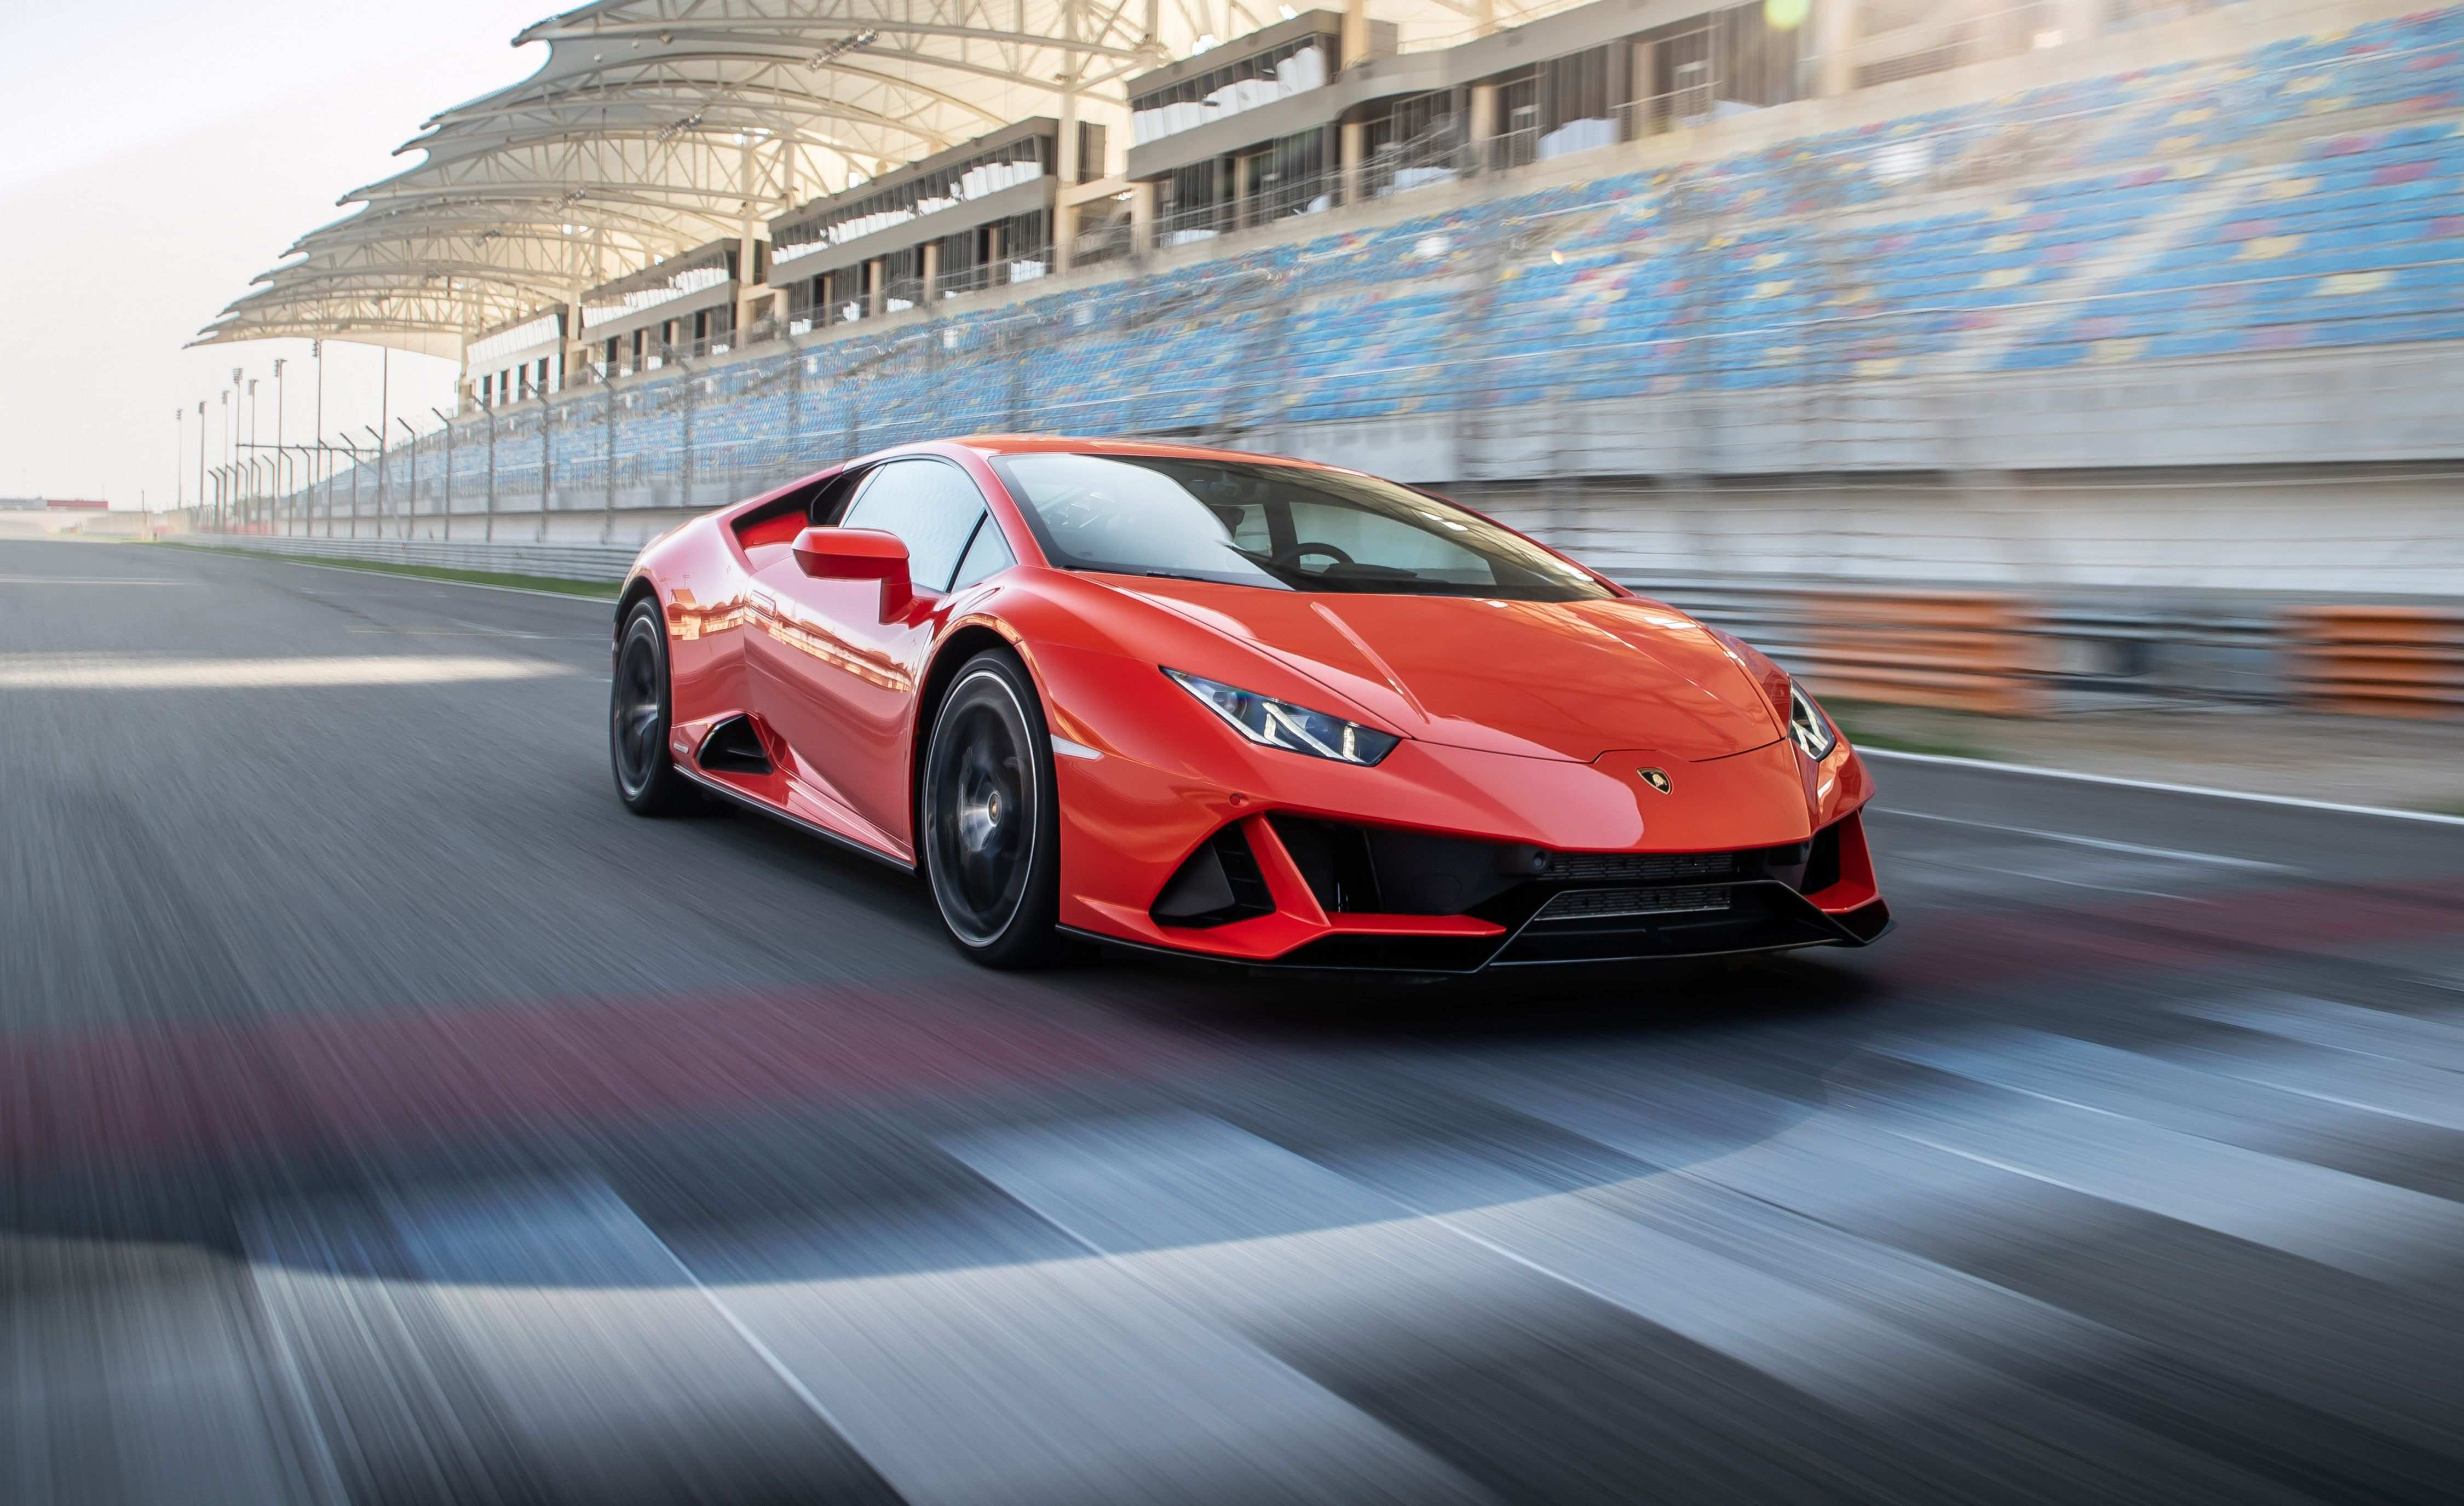 99 Great The 2020 Lamborghini Engine with The 2020 Lamborghini